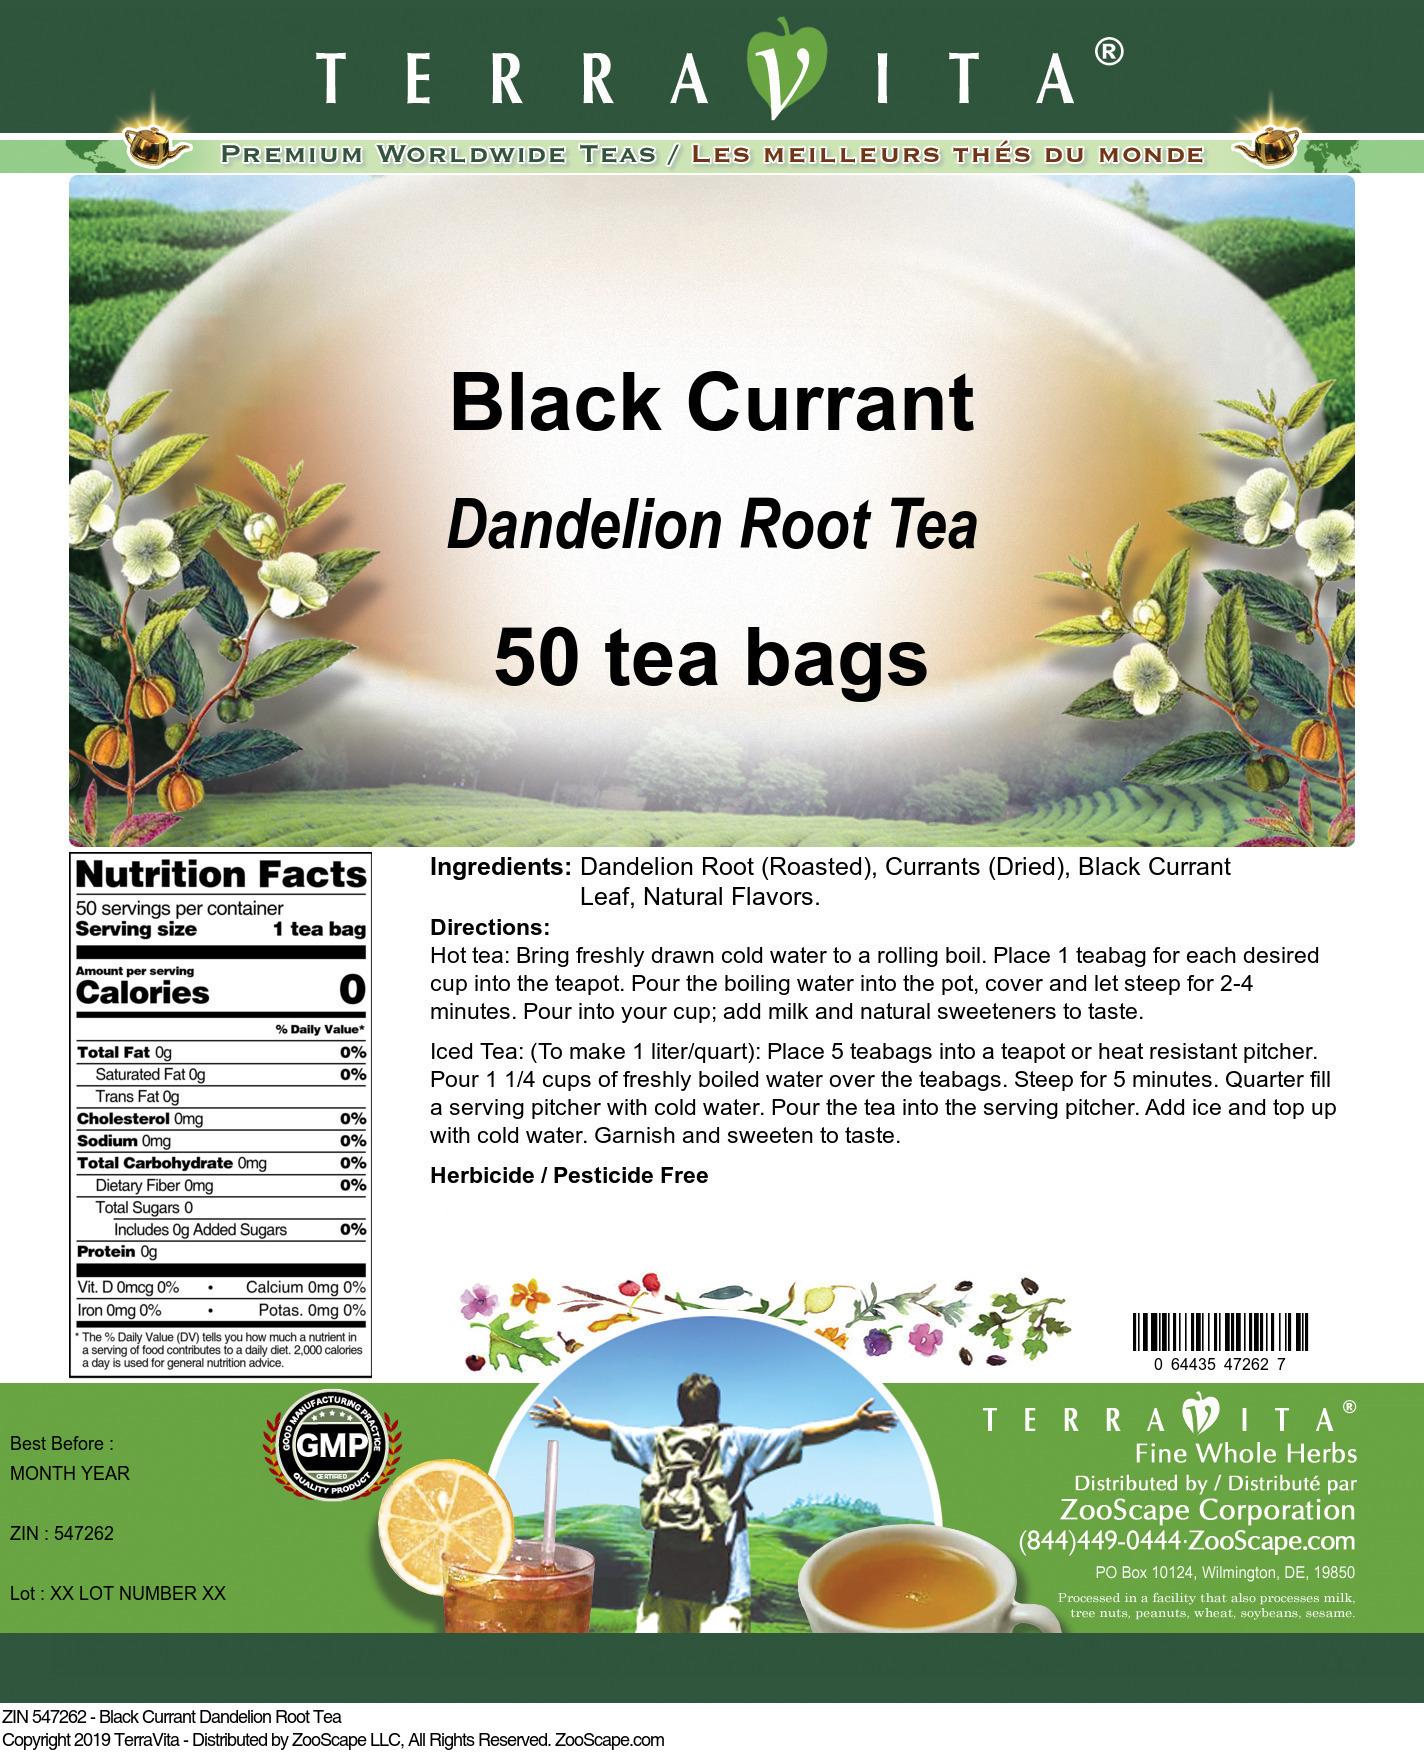 Black Currant Dandelion Root Tea